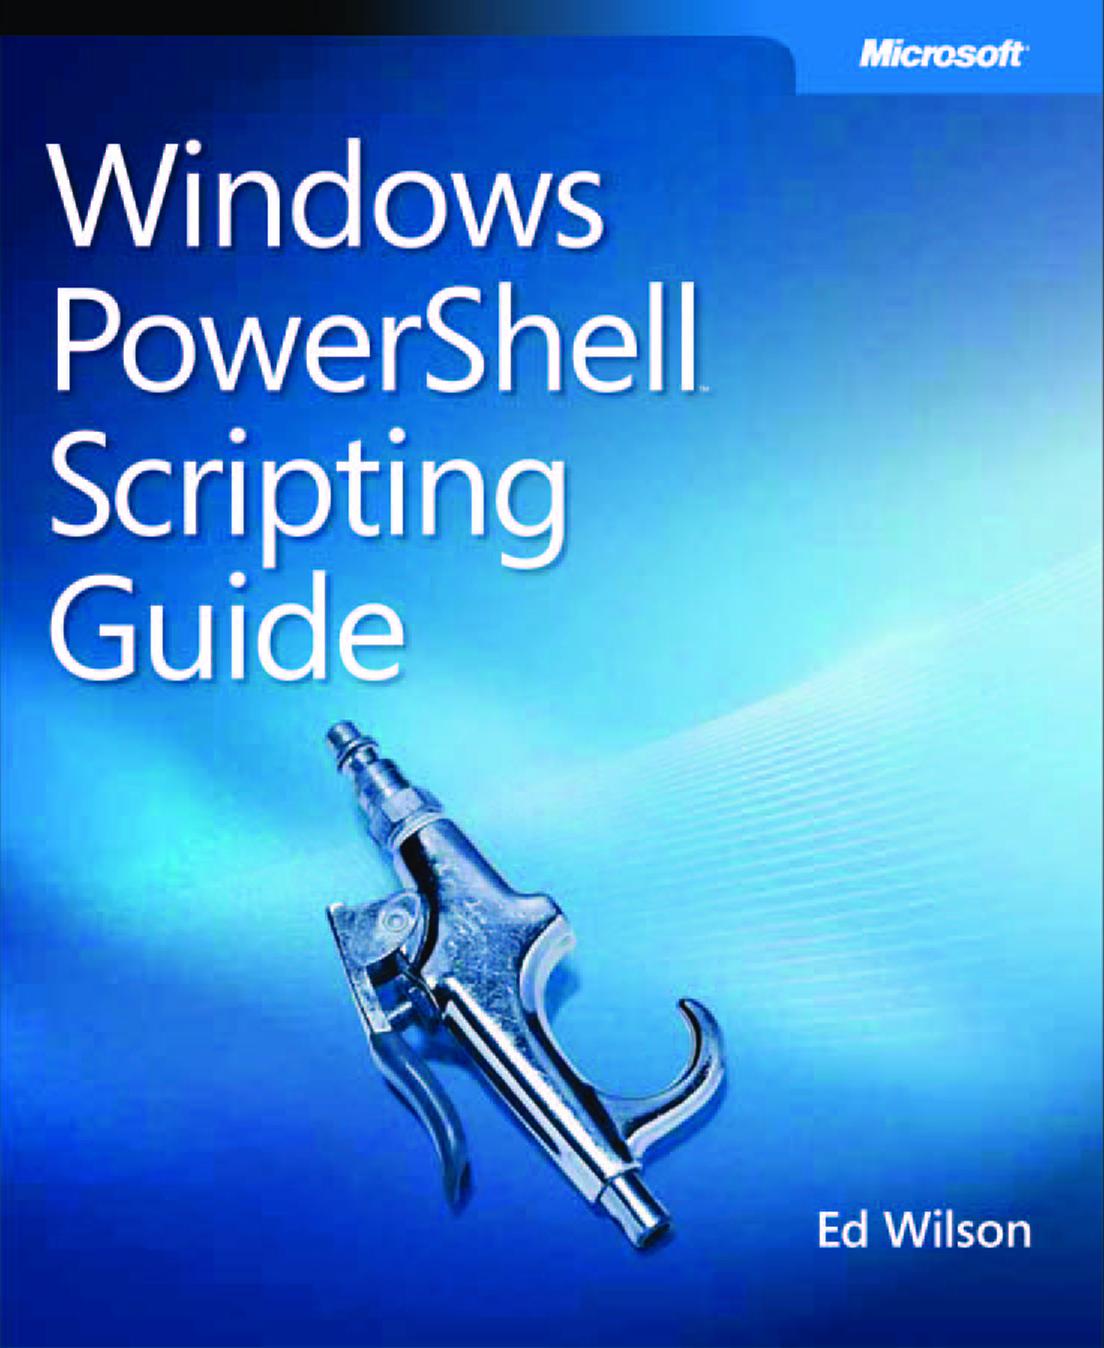 Windows PowerShell Scripting Guide EBook Power Shell(TM)